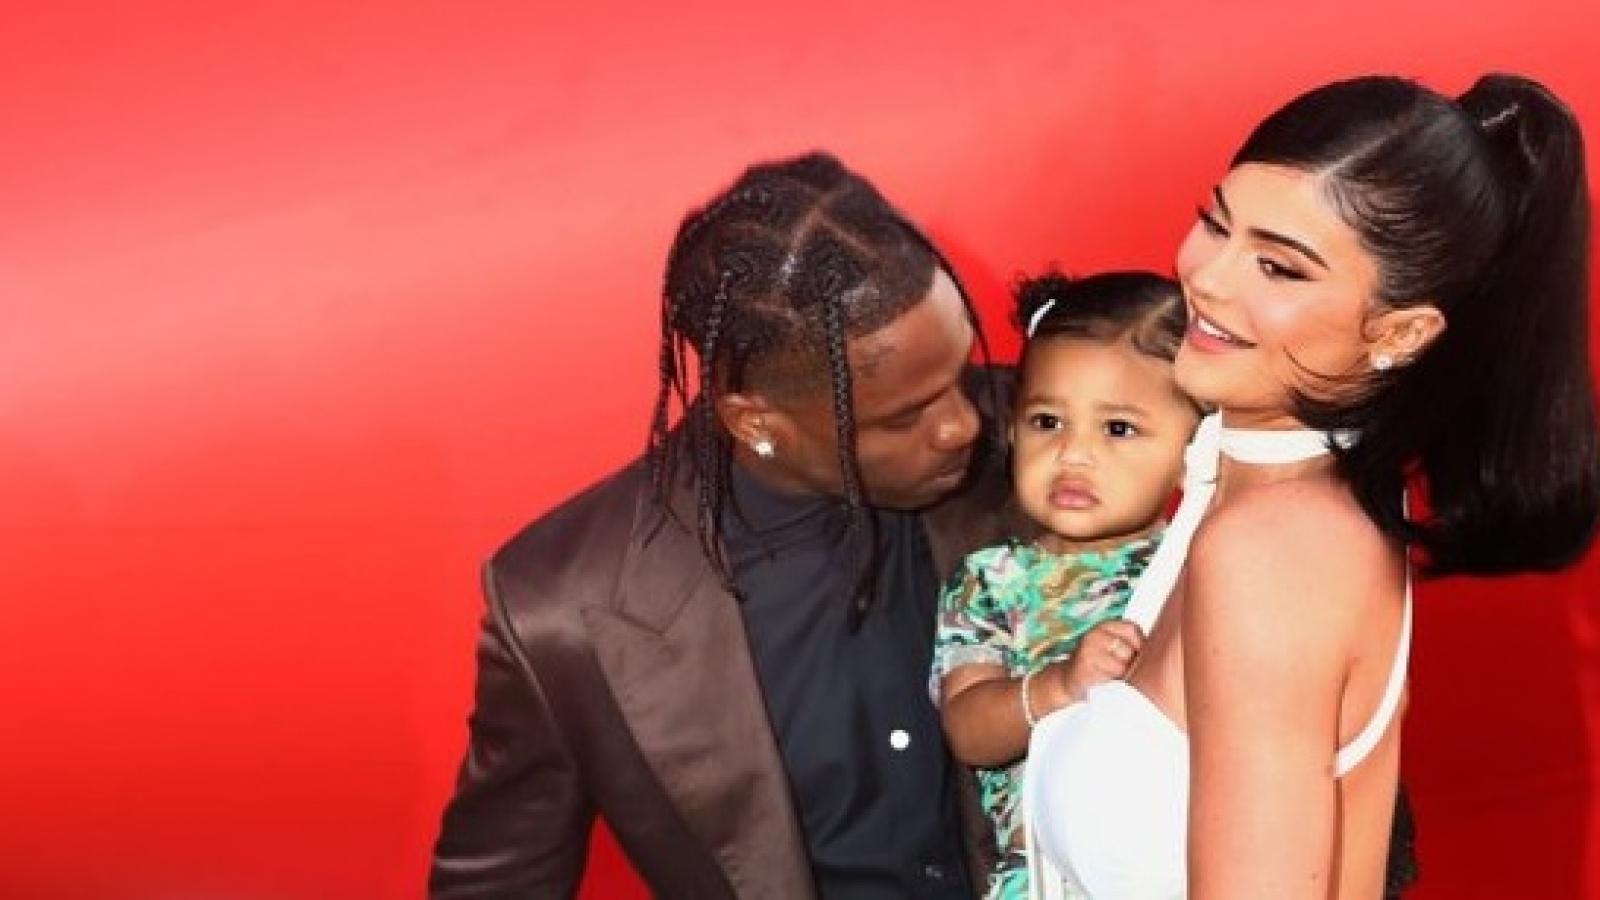 Kylie Jenner mang thai con thứ 2 với rapper Travis Scott